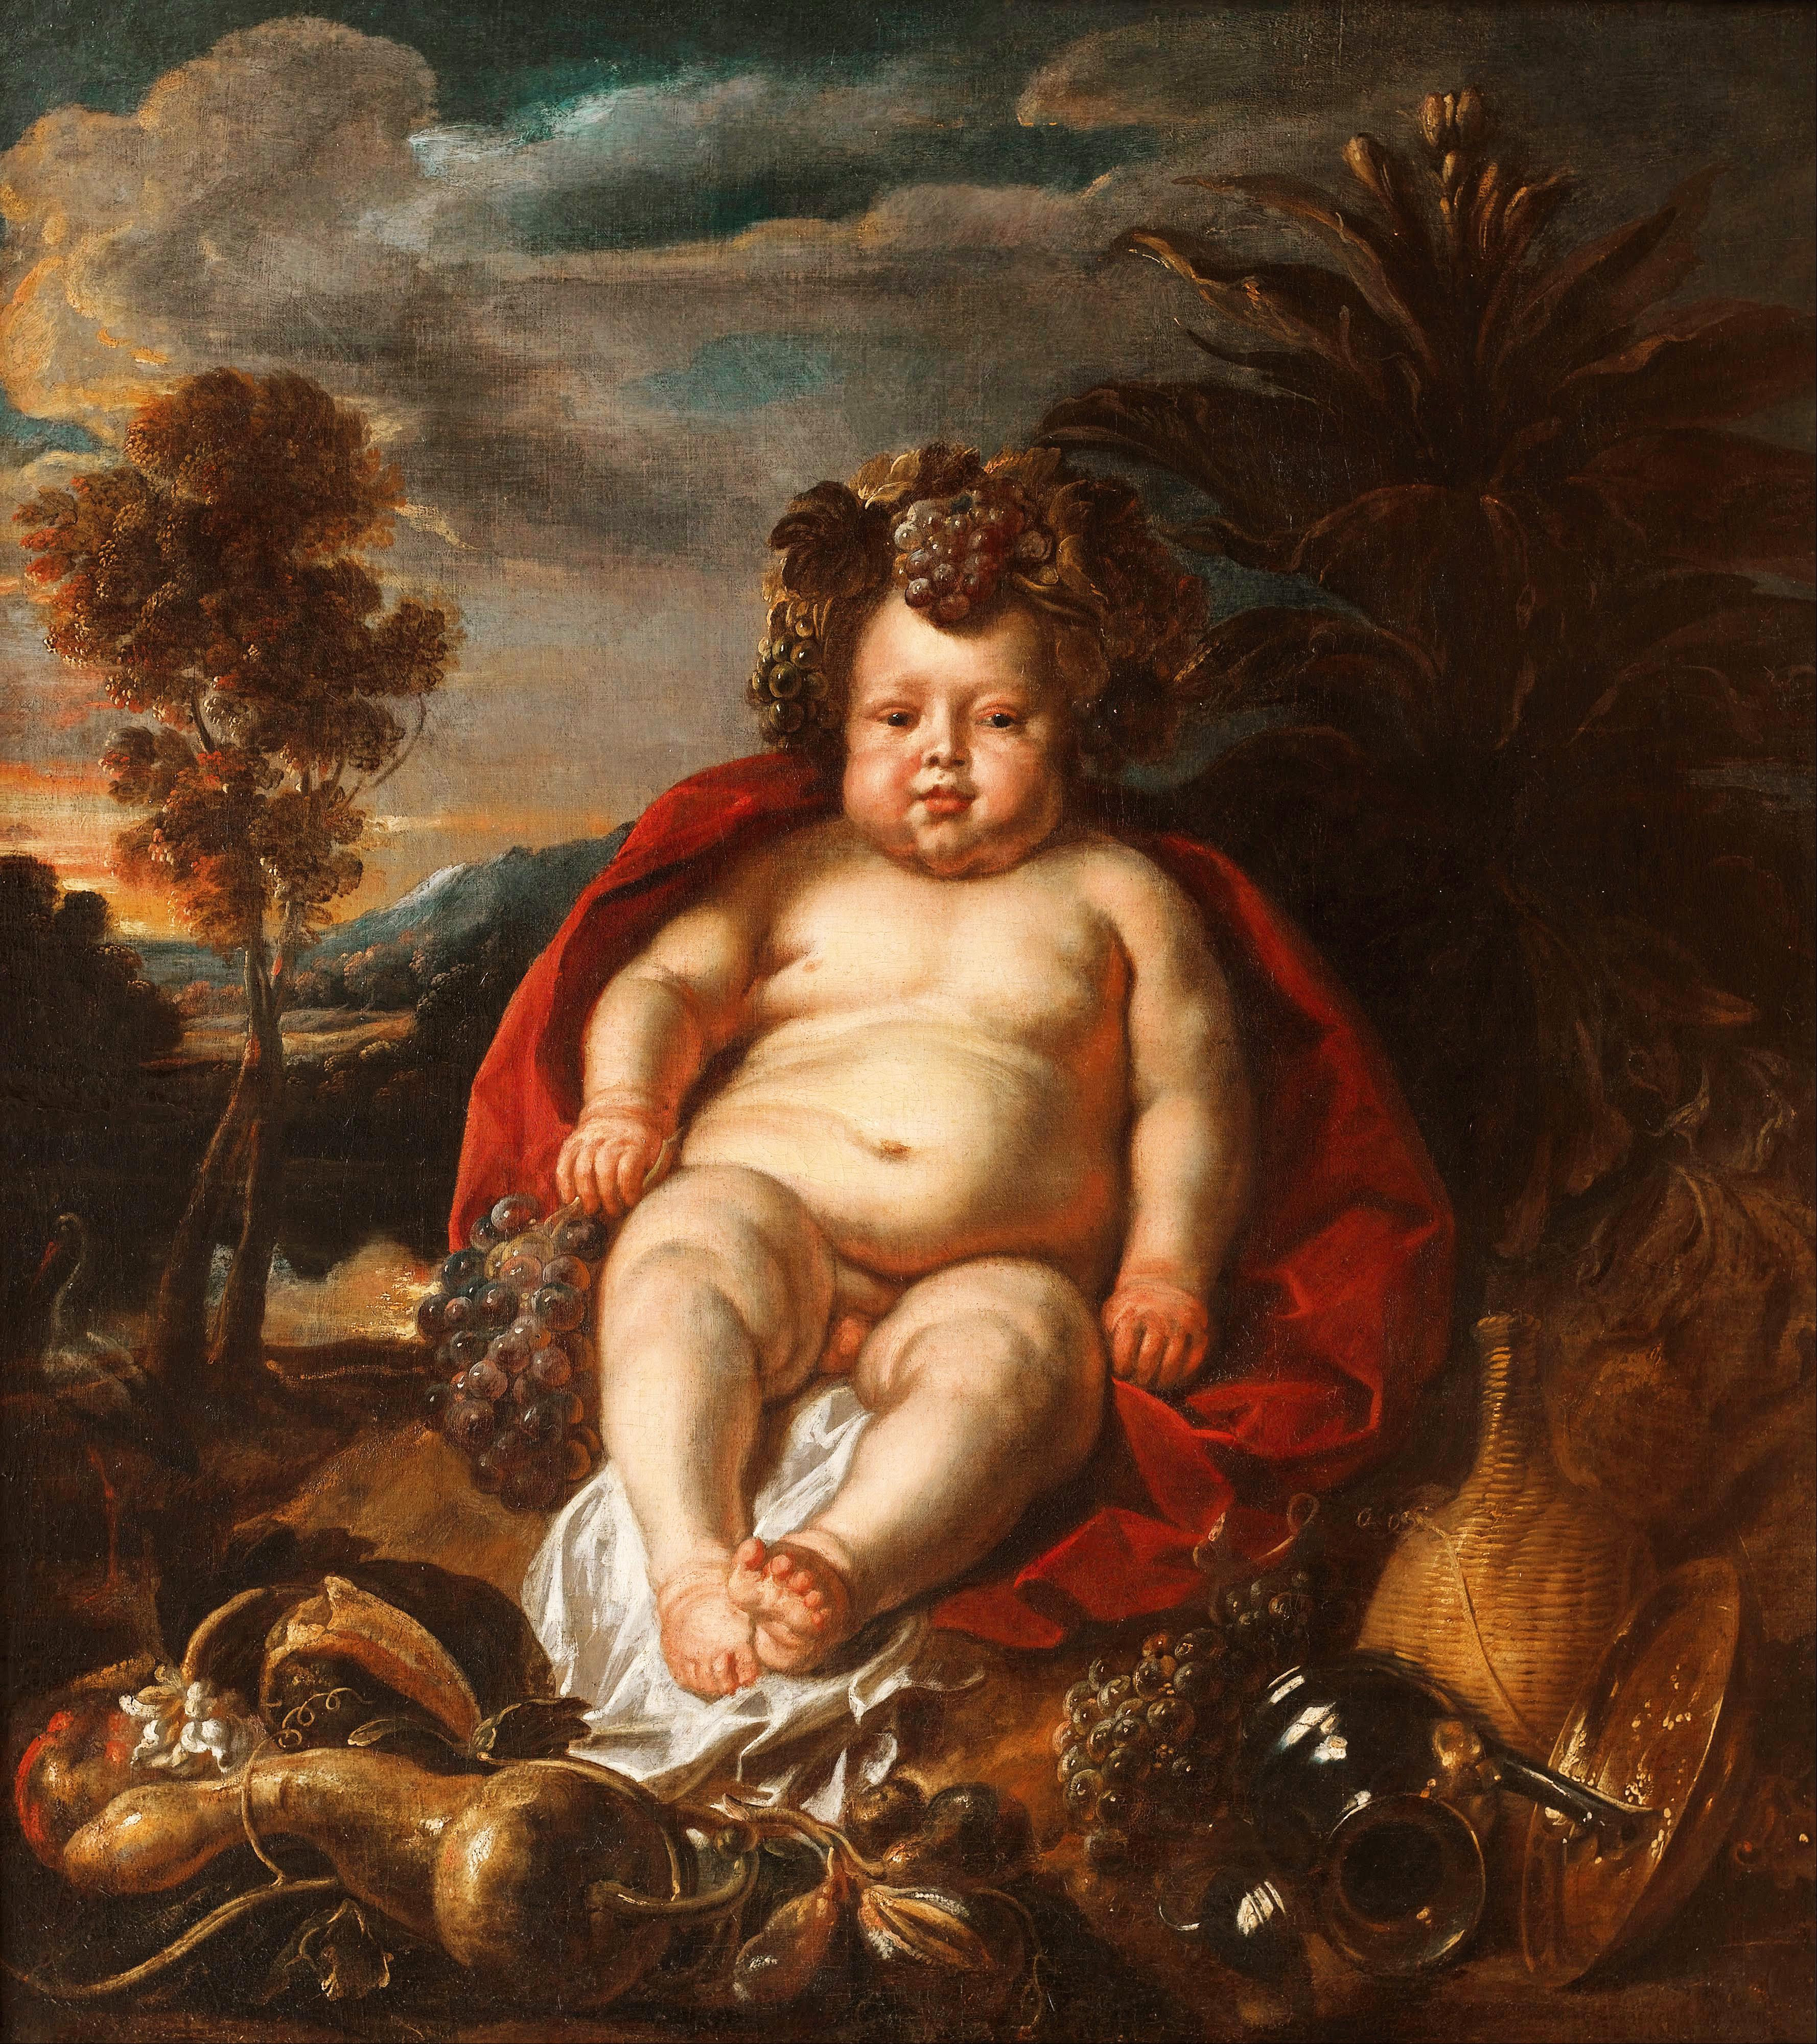 Original file  (3,556 × 4,001 pixels, file size: 3.9 MB, MIME type ...: http://commons.wikimedia.org/wiki/File:Jacob_Jordaens_-_Bacchus_as_a_child_-_Google_Art_Project_-_edited.jpg